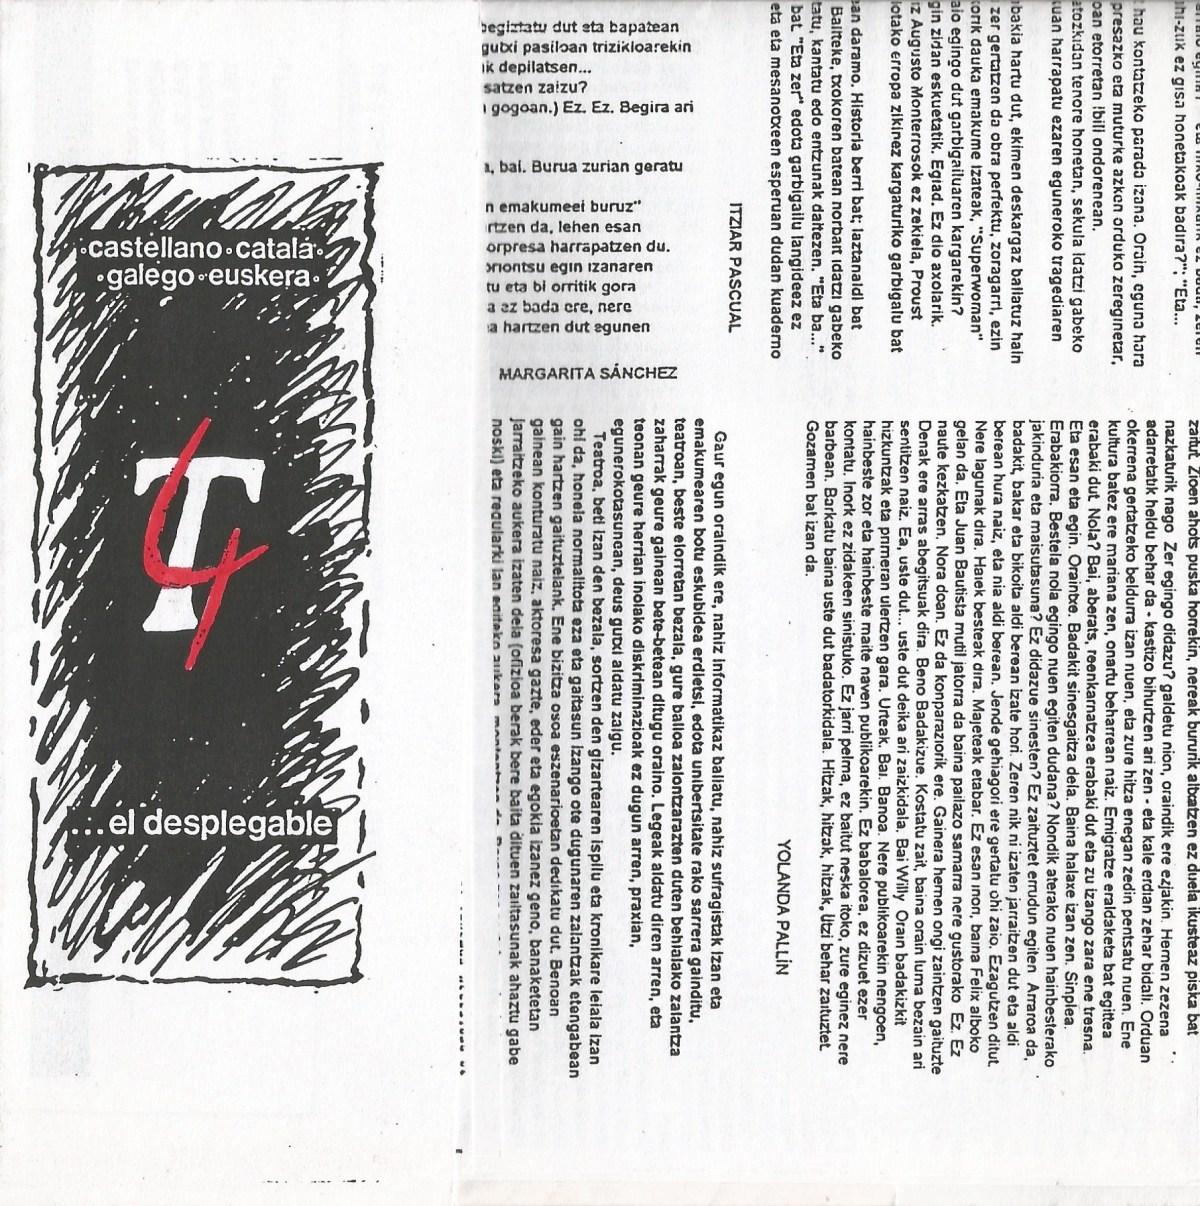 Escanear 8.jpeg